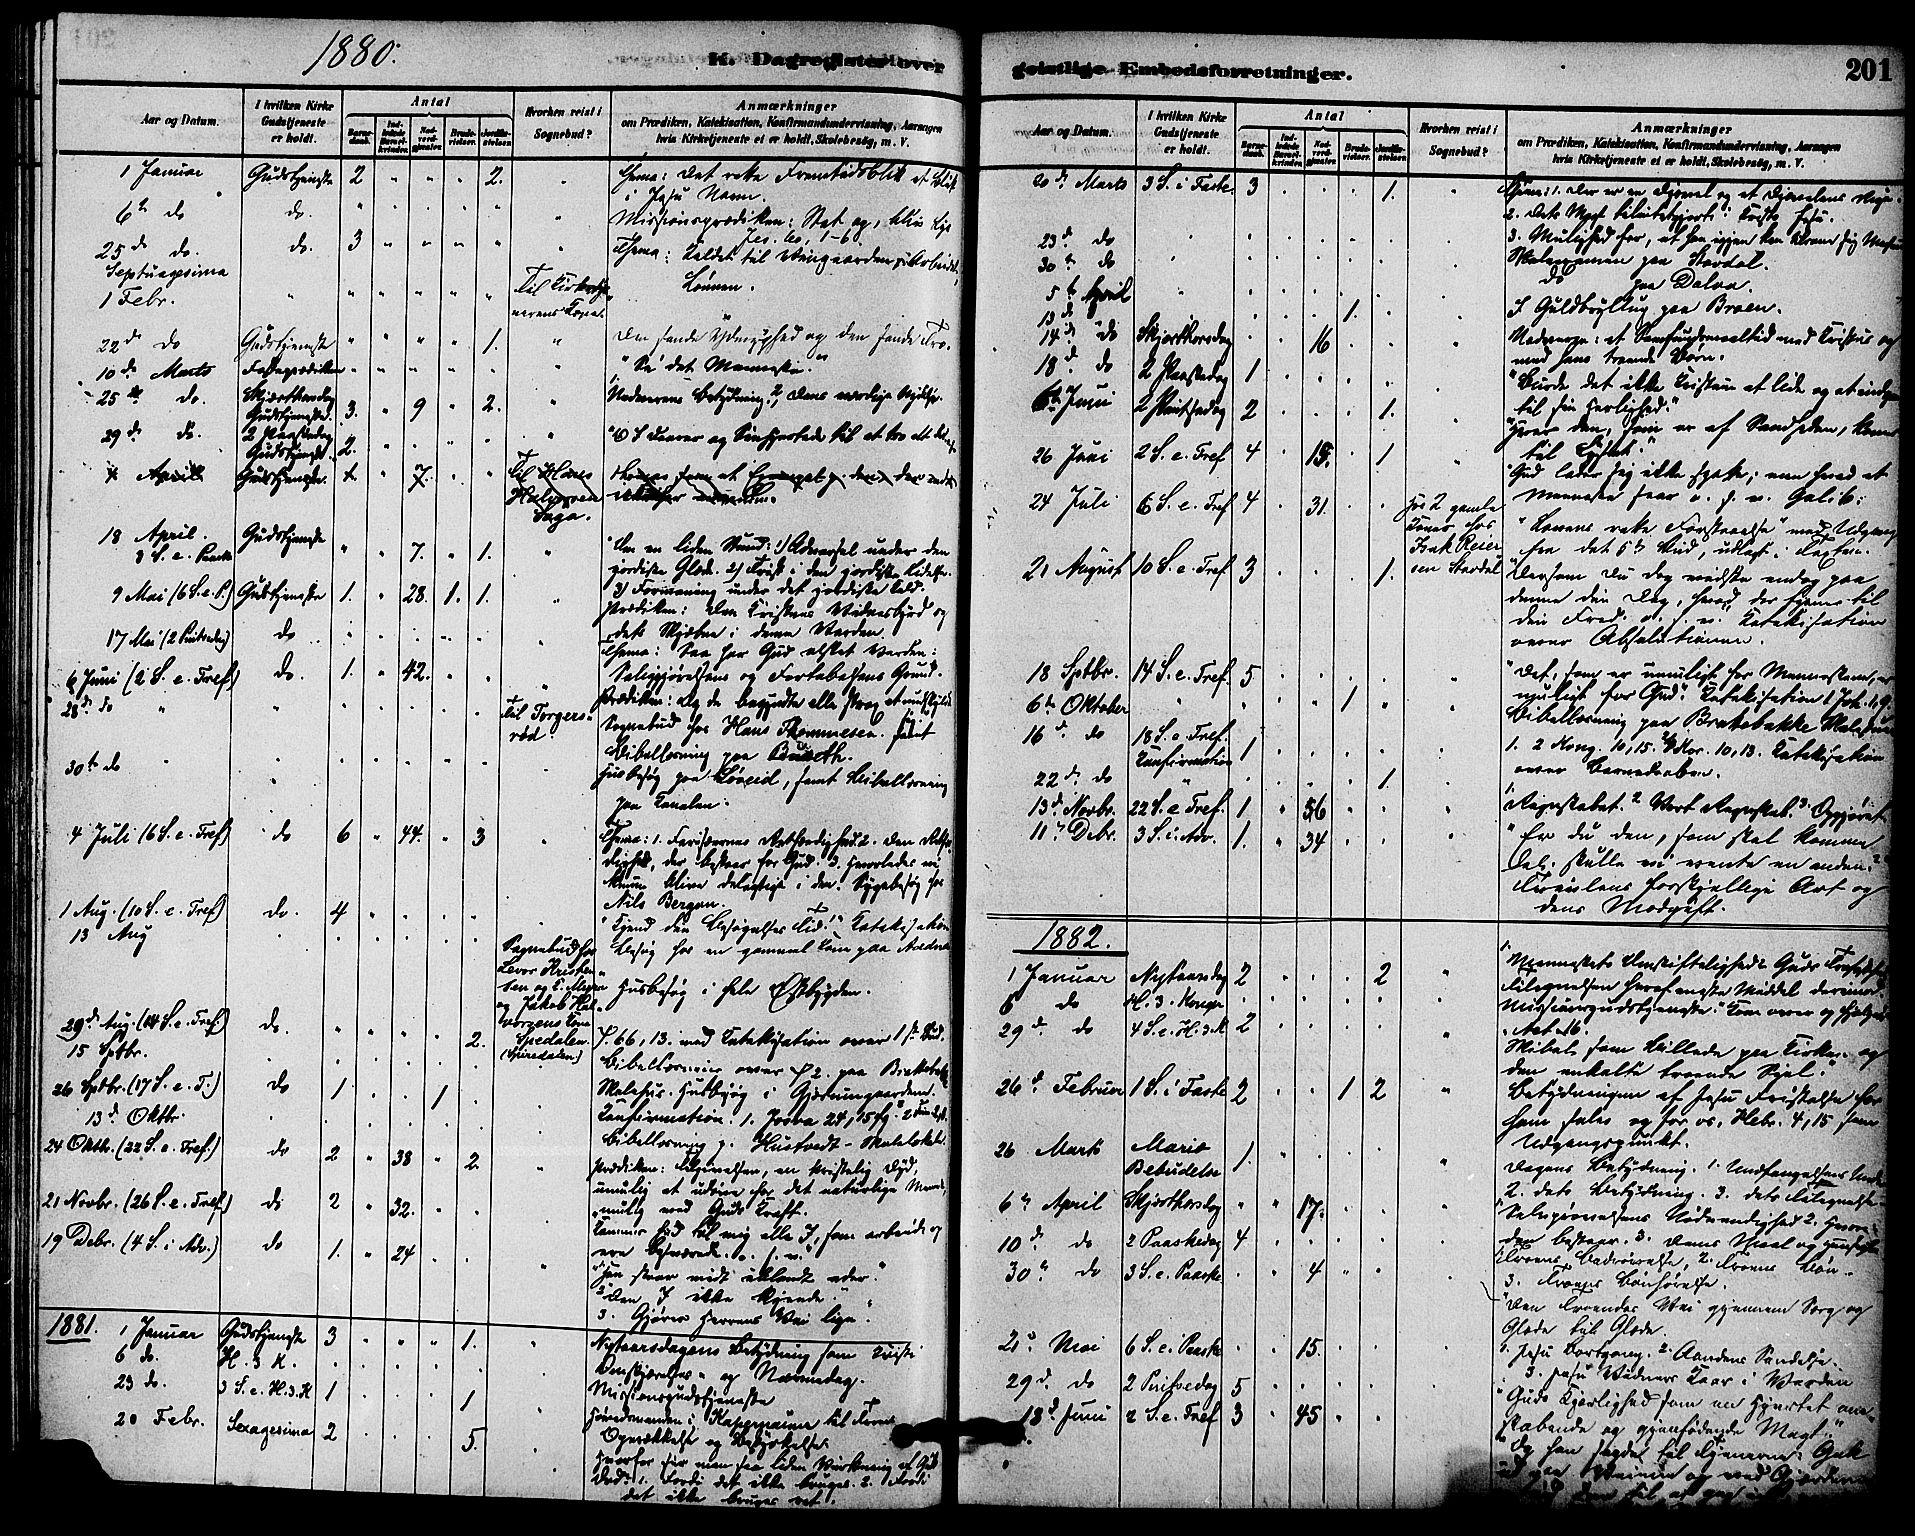 SAKO, Solum kirkebøker, F/Fb/L0001: Ministerialbok nr. II 1, 1877-1892, s. 201